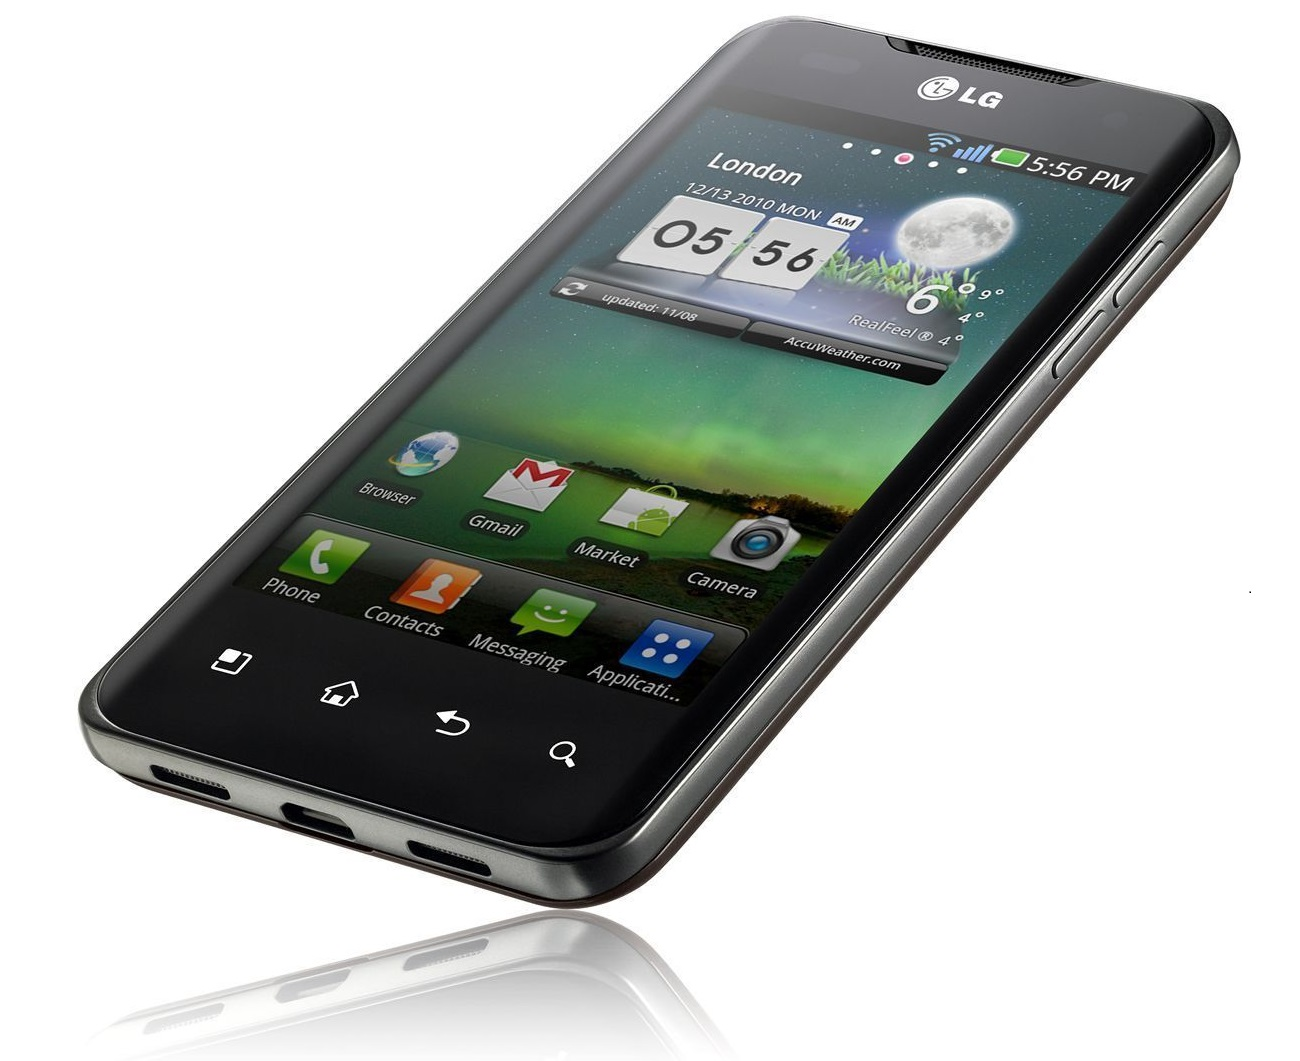 Smartfony LG LG P990